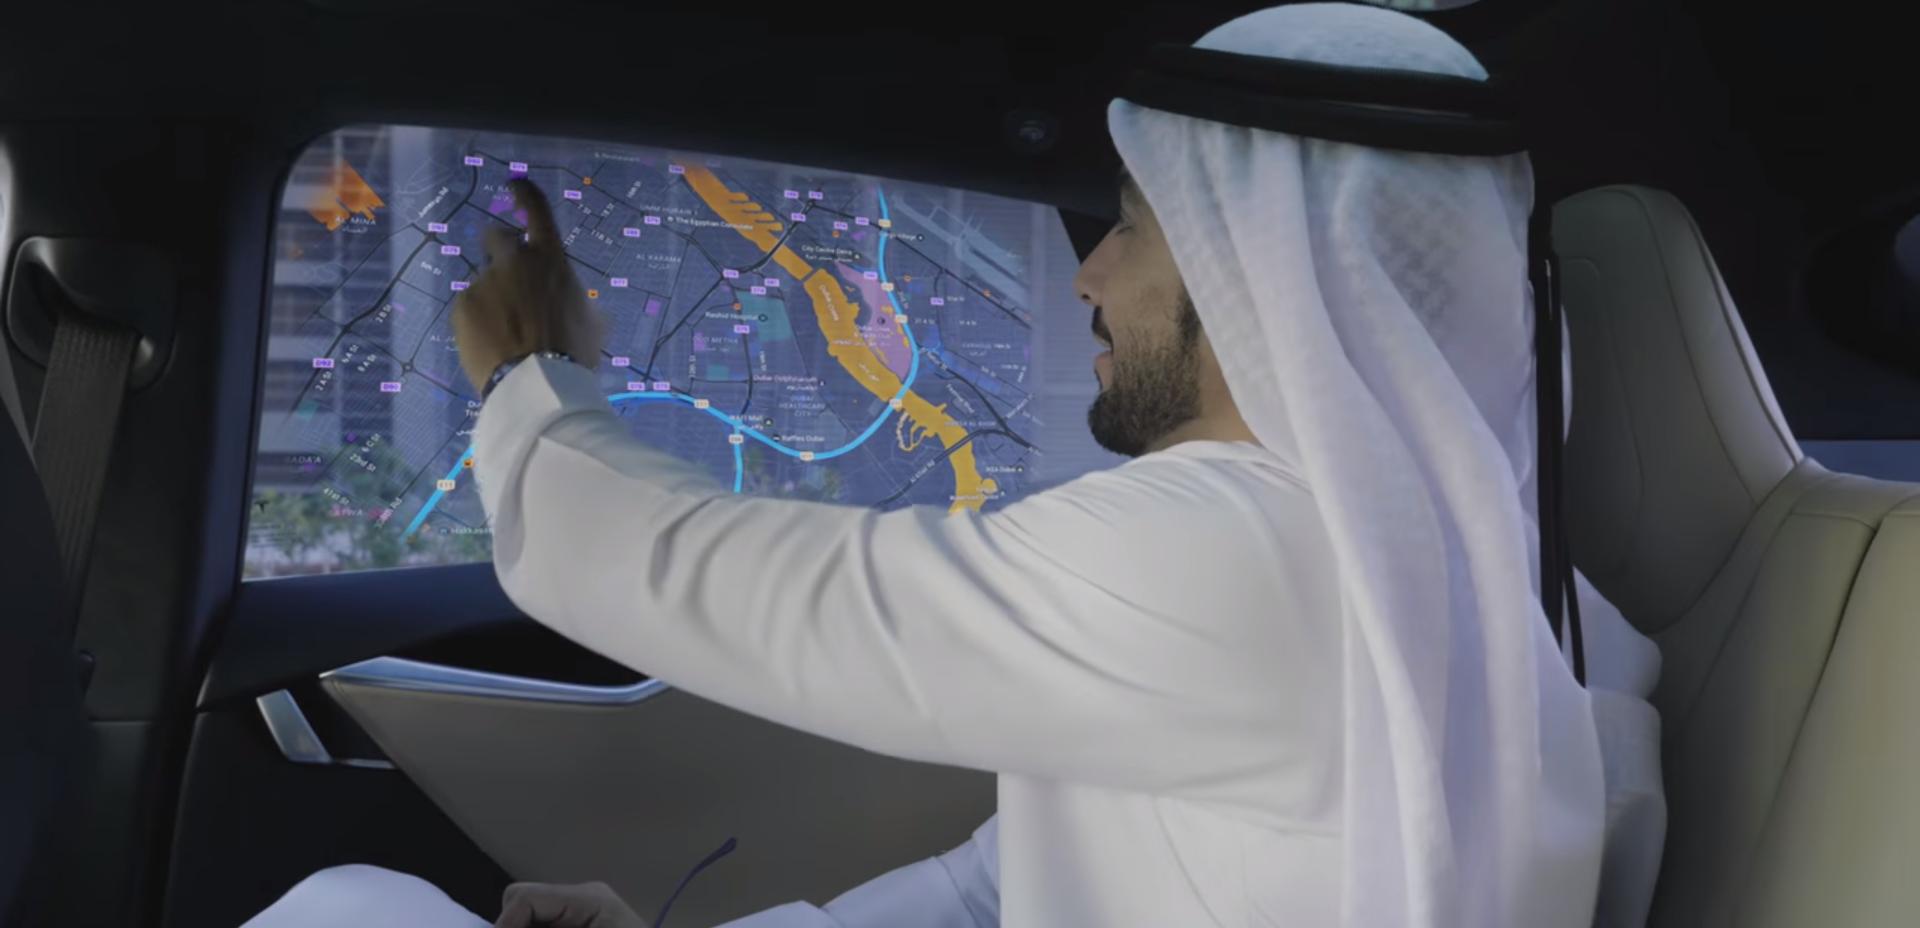 dubai driverless tesla concept